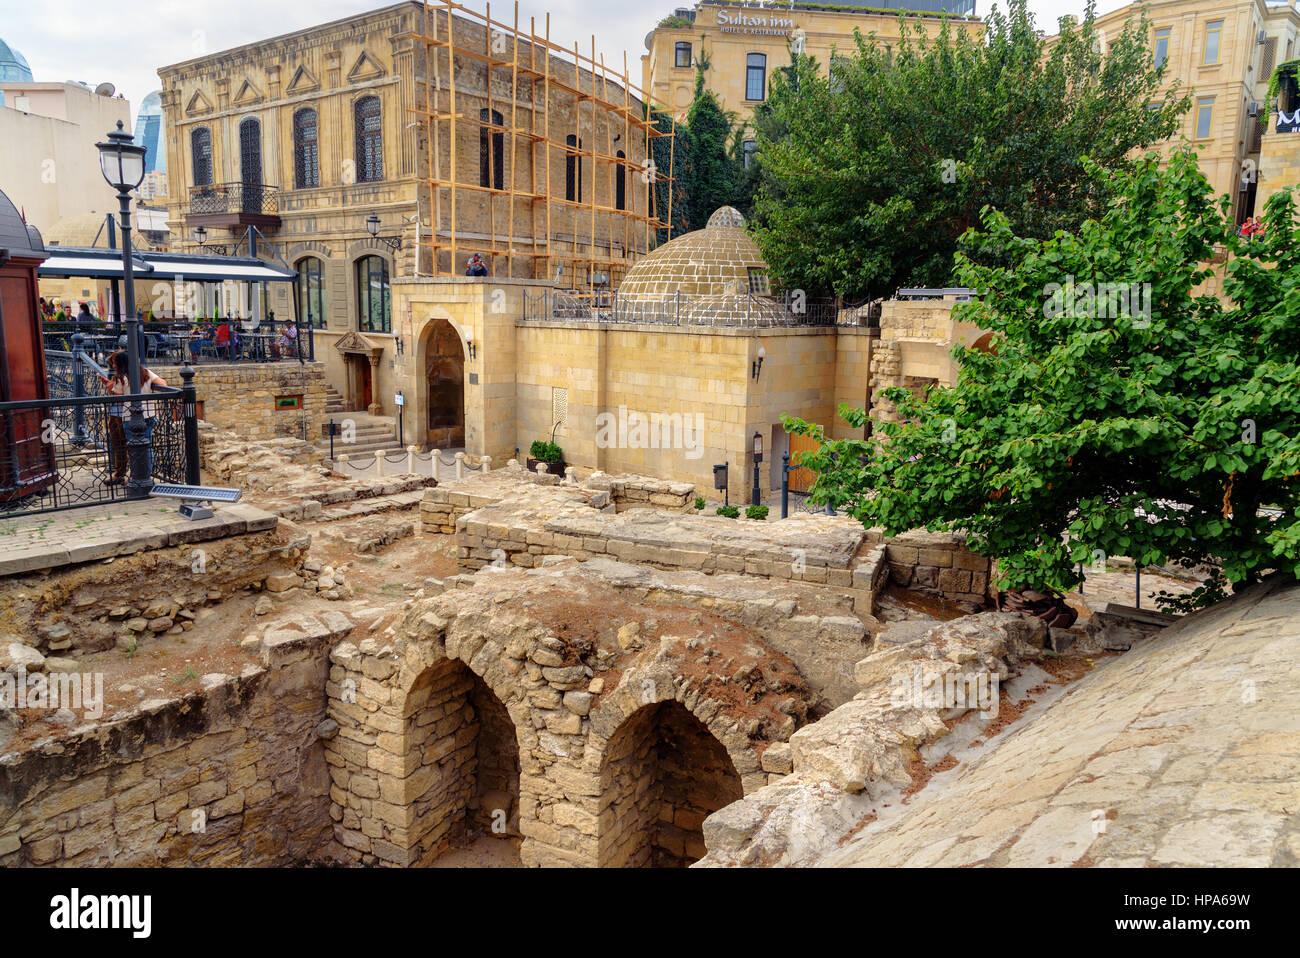 Baku, Azerbaijan - September 10, 2016: Remains of the Church of St Batholomew in Old city, Icheri Sheher is the - Stock Image